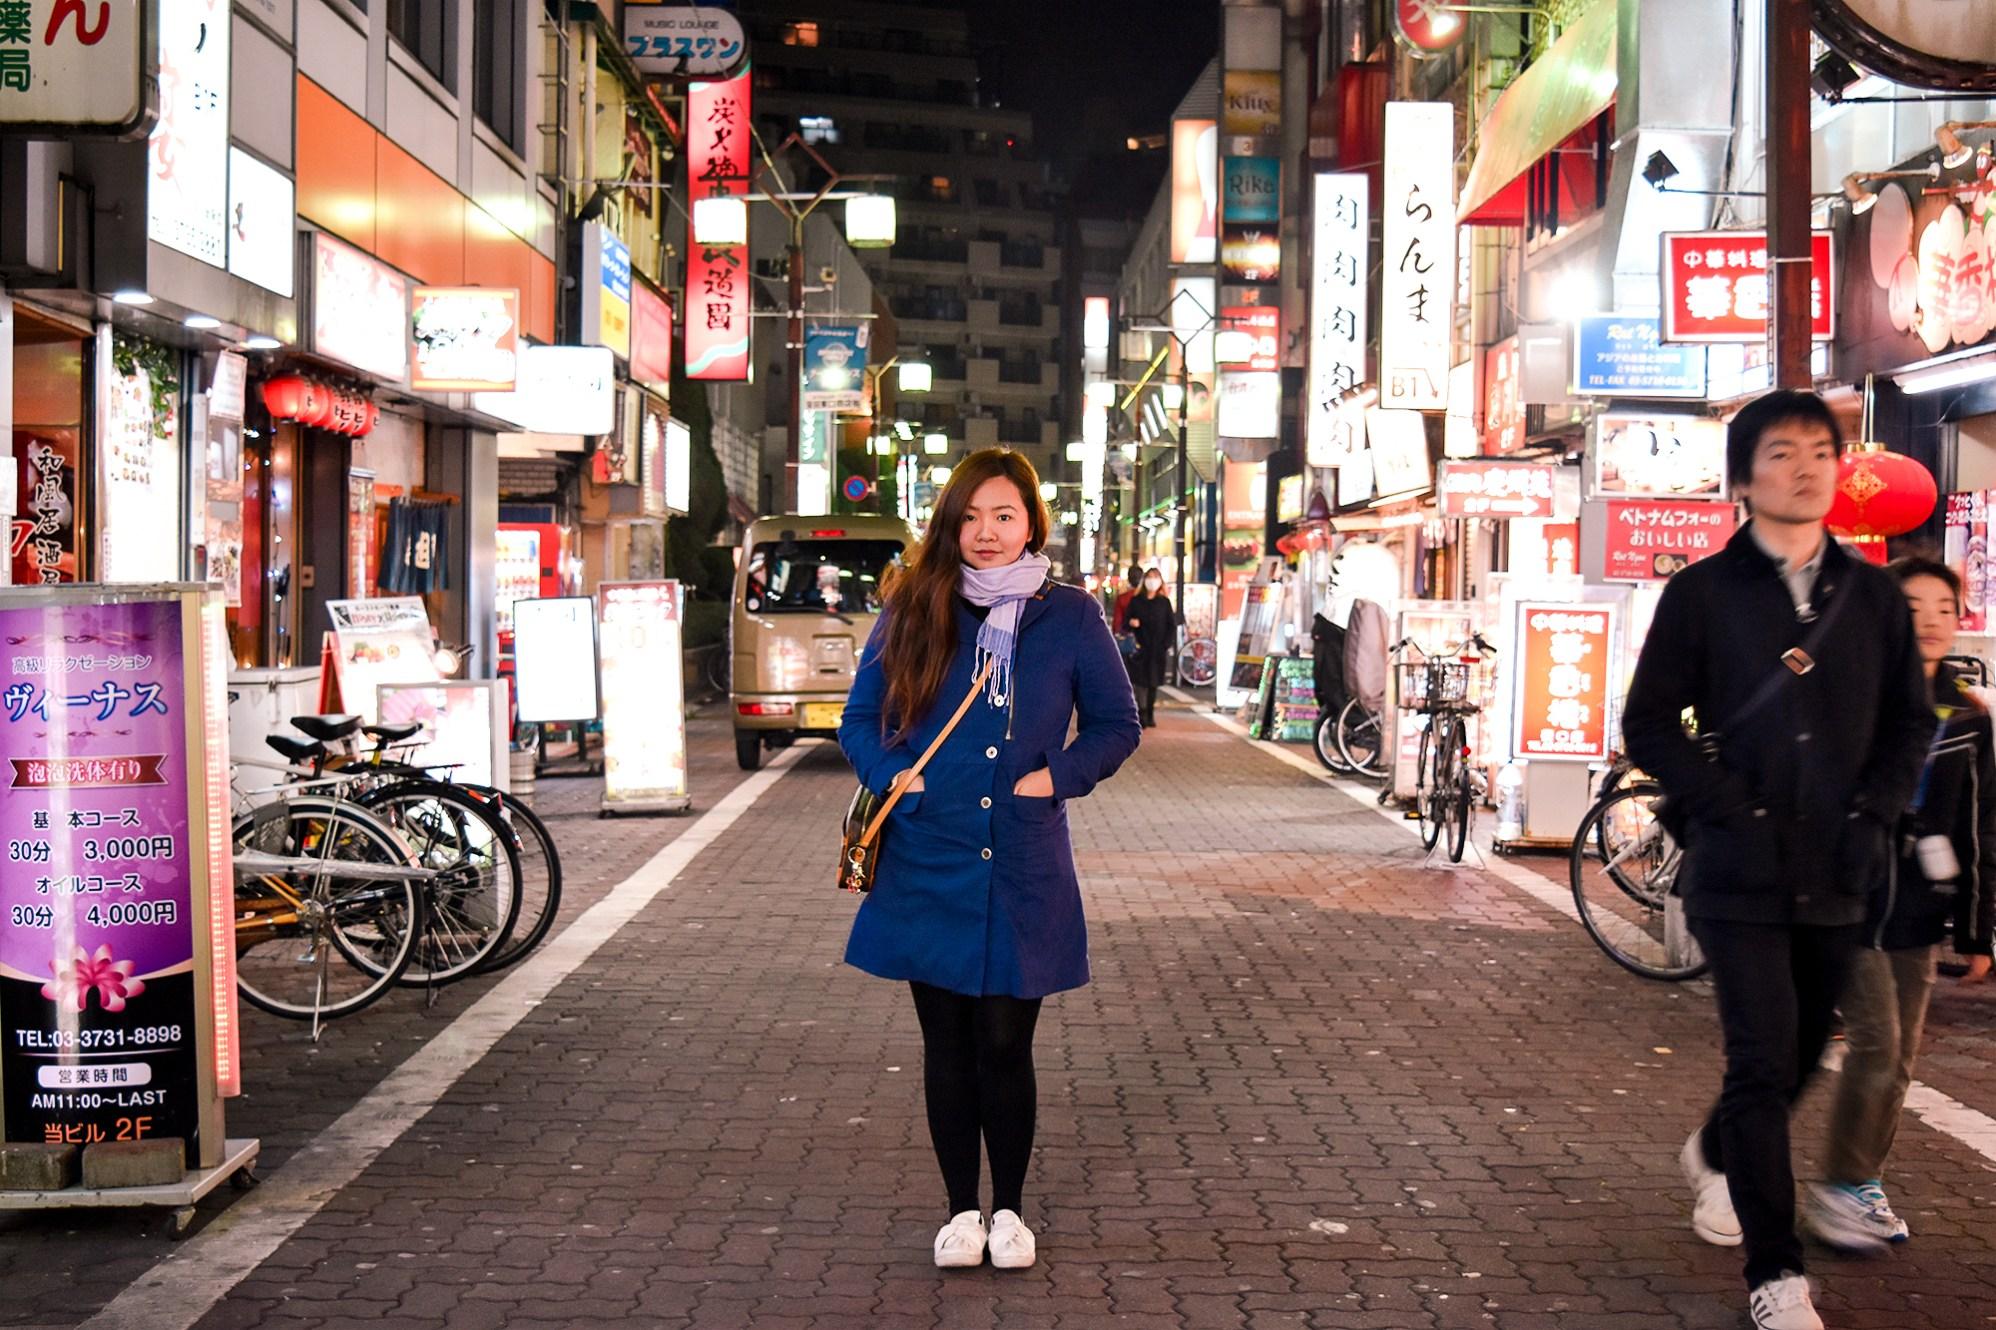 The streets of Kamata, Tokyo